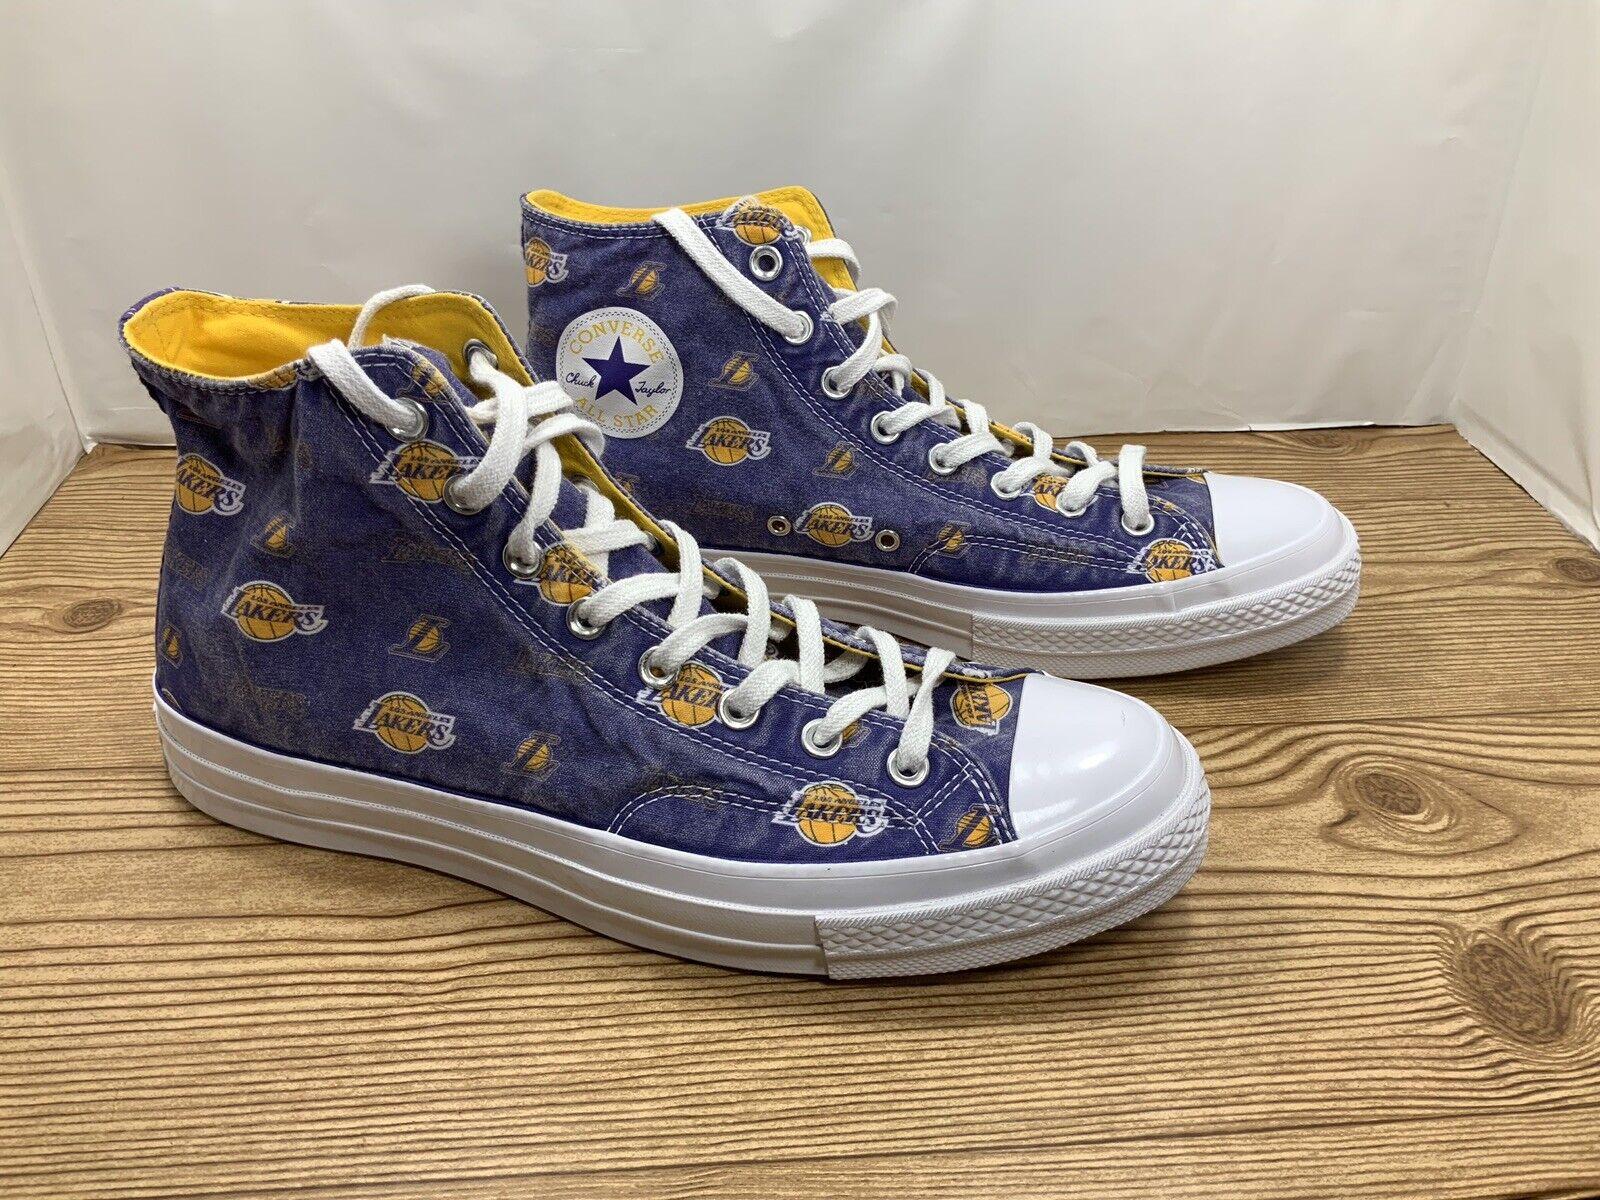 "Converse Chuck Taylor All Star 70's Hi ""Los Angeles Lakers"", Mens Size 10.5"